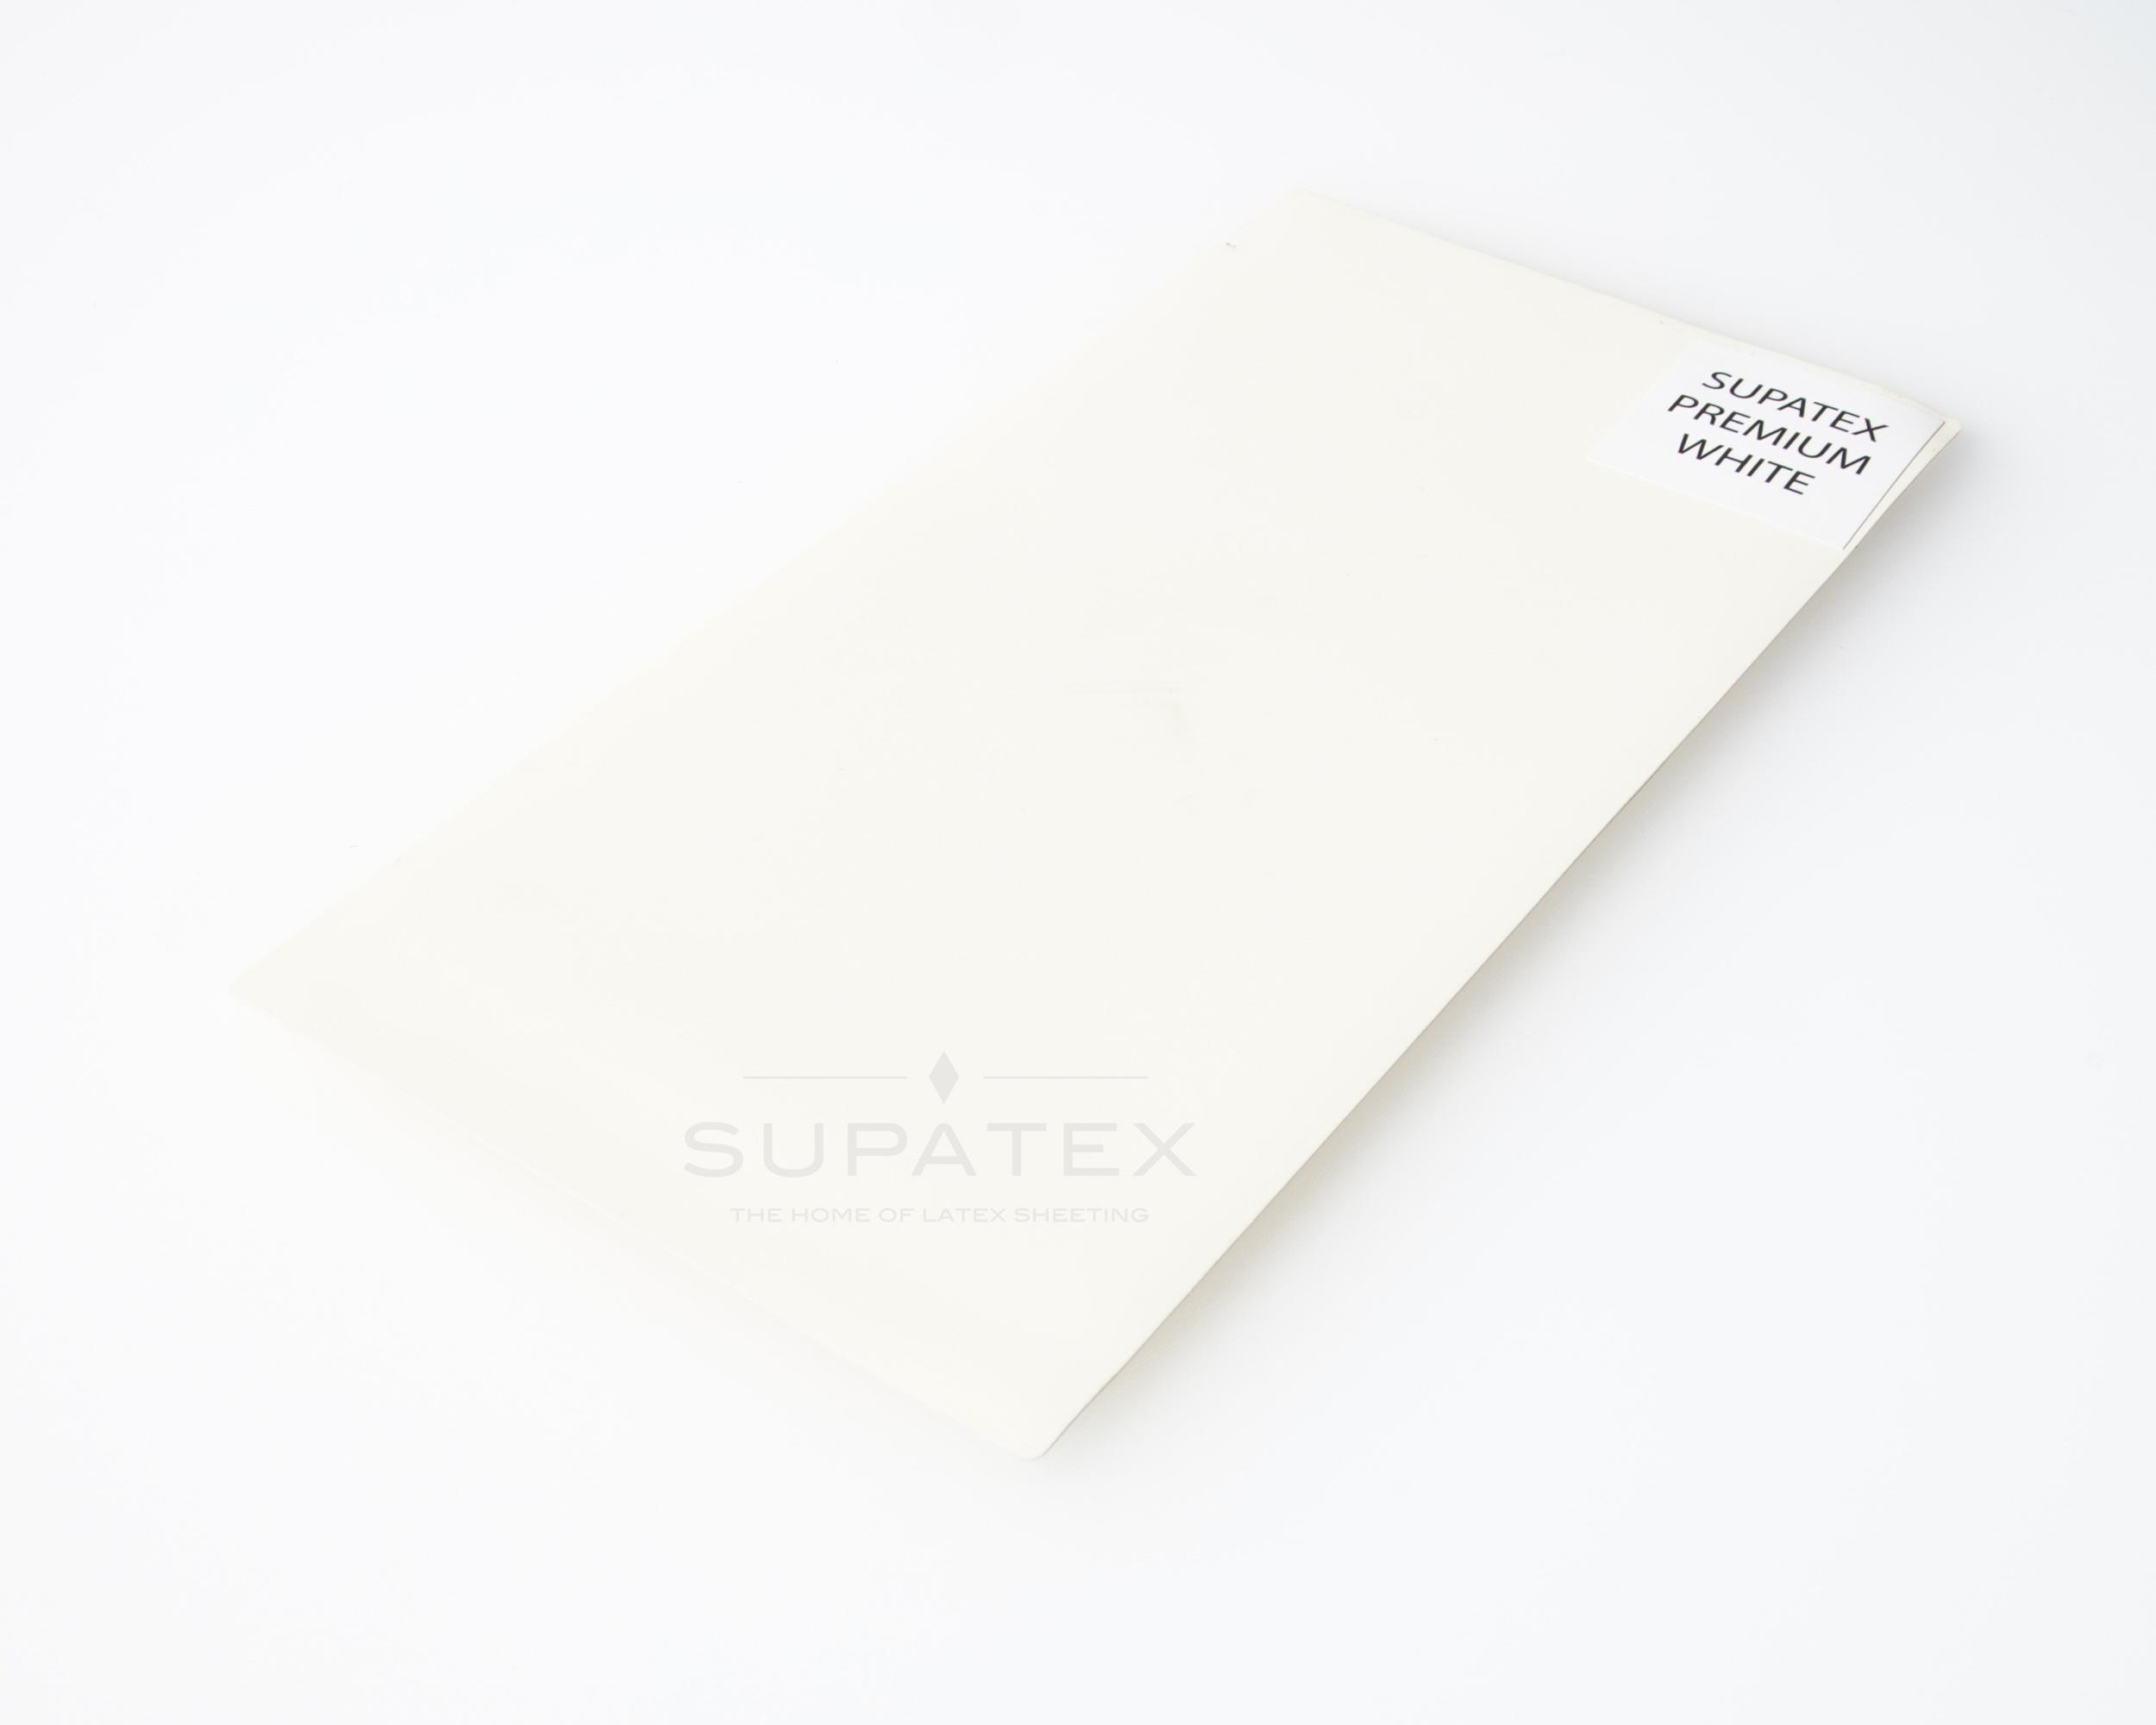 Supatex Bright White 0.33 mm